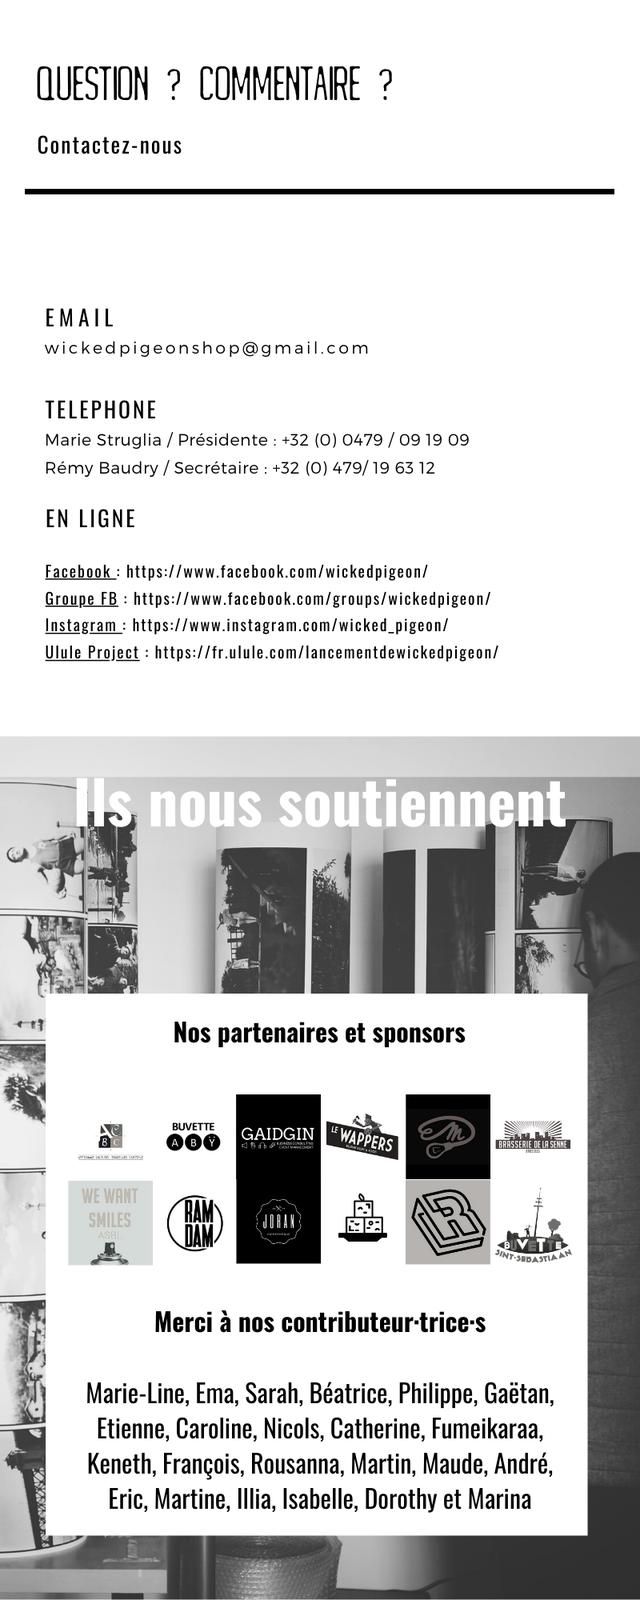 QUESTION ? COMMENTAIRE ? Contactez-nous EMAIL wickedpigeonshop@gmail.com TELEPHONE Marie Struglia Presidente +32 (0) 0479 / 09 19 09 Remy Baudry / Secretaire +32 (0) 479/ 19 63 12 EN LIGNE facebook https:llwww.facebook.com/wickedpigeon/ Groupe FB https:llwww.facebook.comlgroupslwickedpigeon/ Instagram https:l/www.instagram.com/wicked.pigeon Ulule Project :https:llfrulule.comllancementdewickedpigeon/ nous soutiennent Nos partenaires et sponsors BUVETTE GAIDGIN WAPPERS WE WANT SMILES RAM Merci a nos contributeur-trice-s Marie-Line, Ema, Sarah, Beatrice, Philippe, Gaetan, Etienne, Caroline Nicols, Catherine, Fumeikaraa, Keneth, Francois, Rousanna, Martin, Maude, Andre, Eric, Martine, Isabelle, Dorothy et Marina